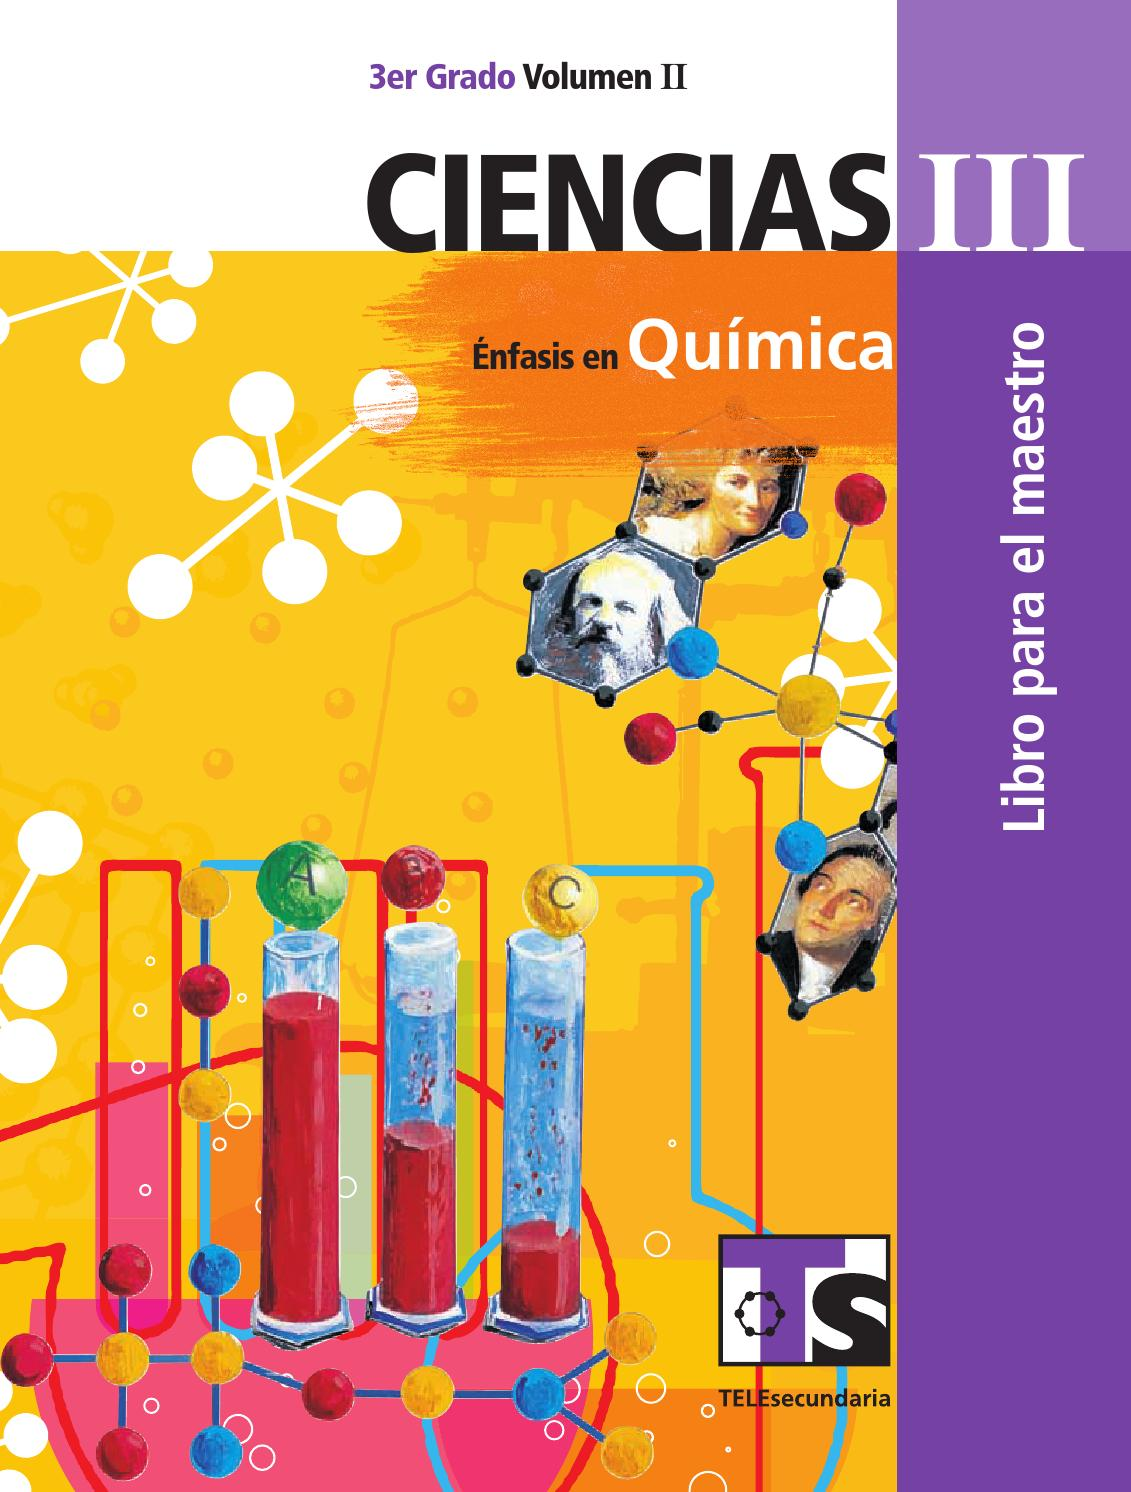 Maestro. Ciencias 3er. Grado Volumen II By Rarámuri - Issuu @tataya.com.mx